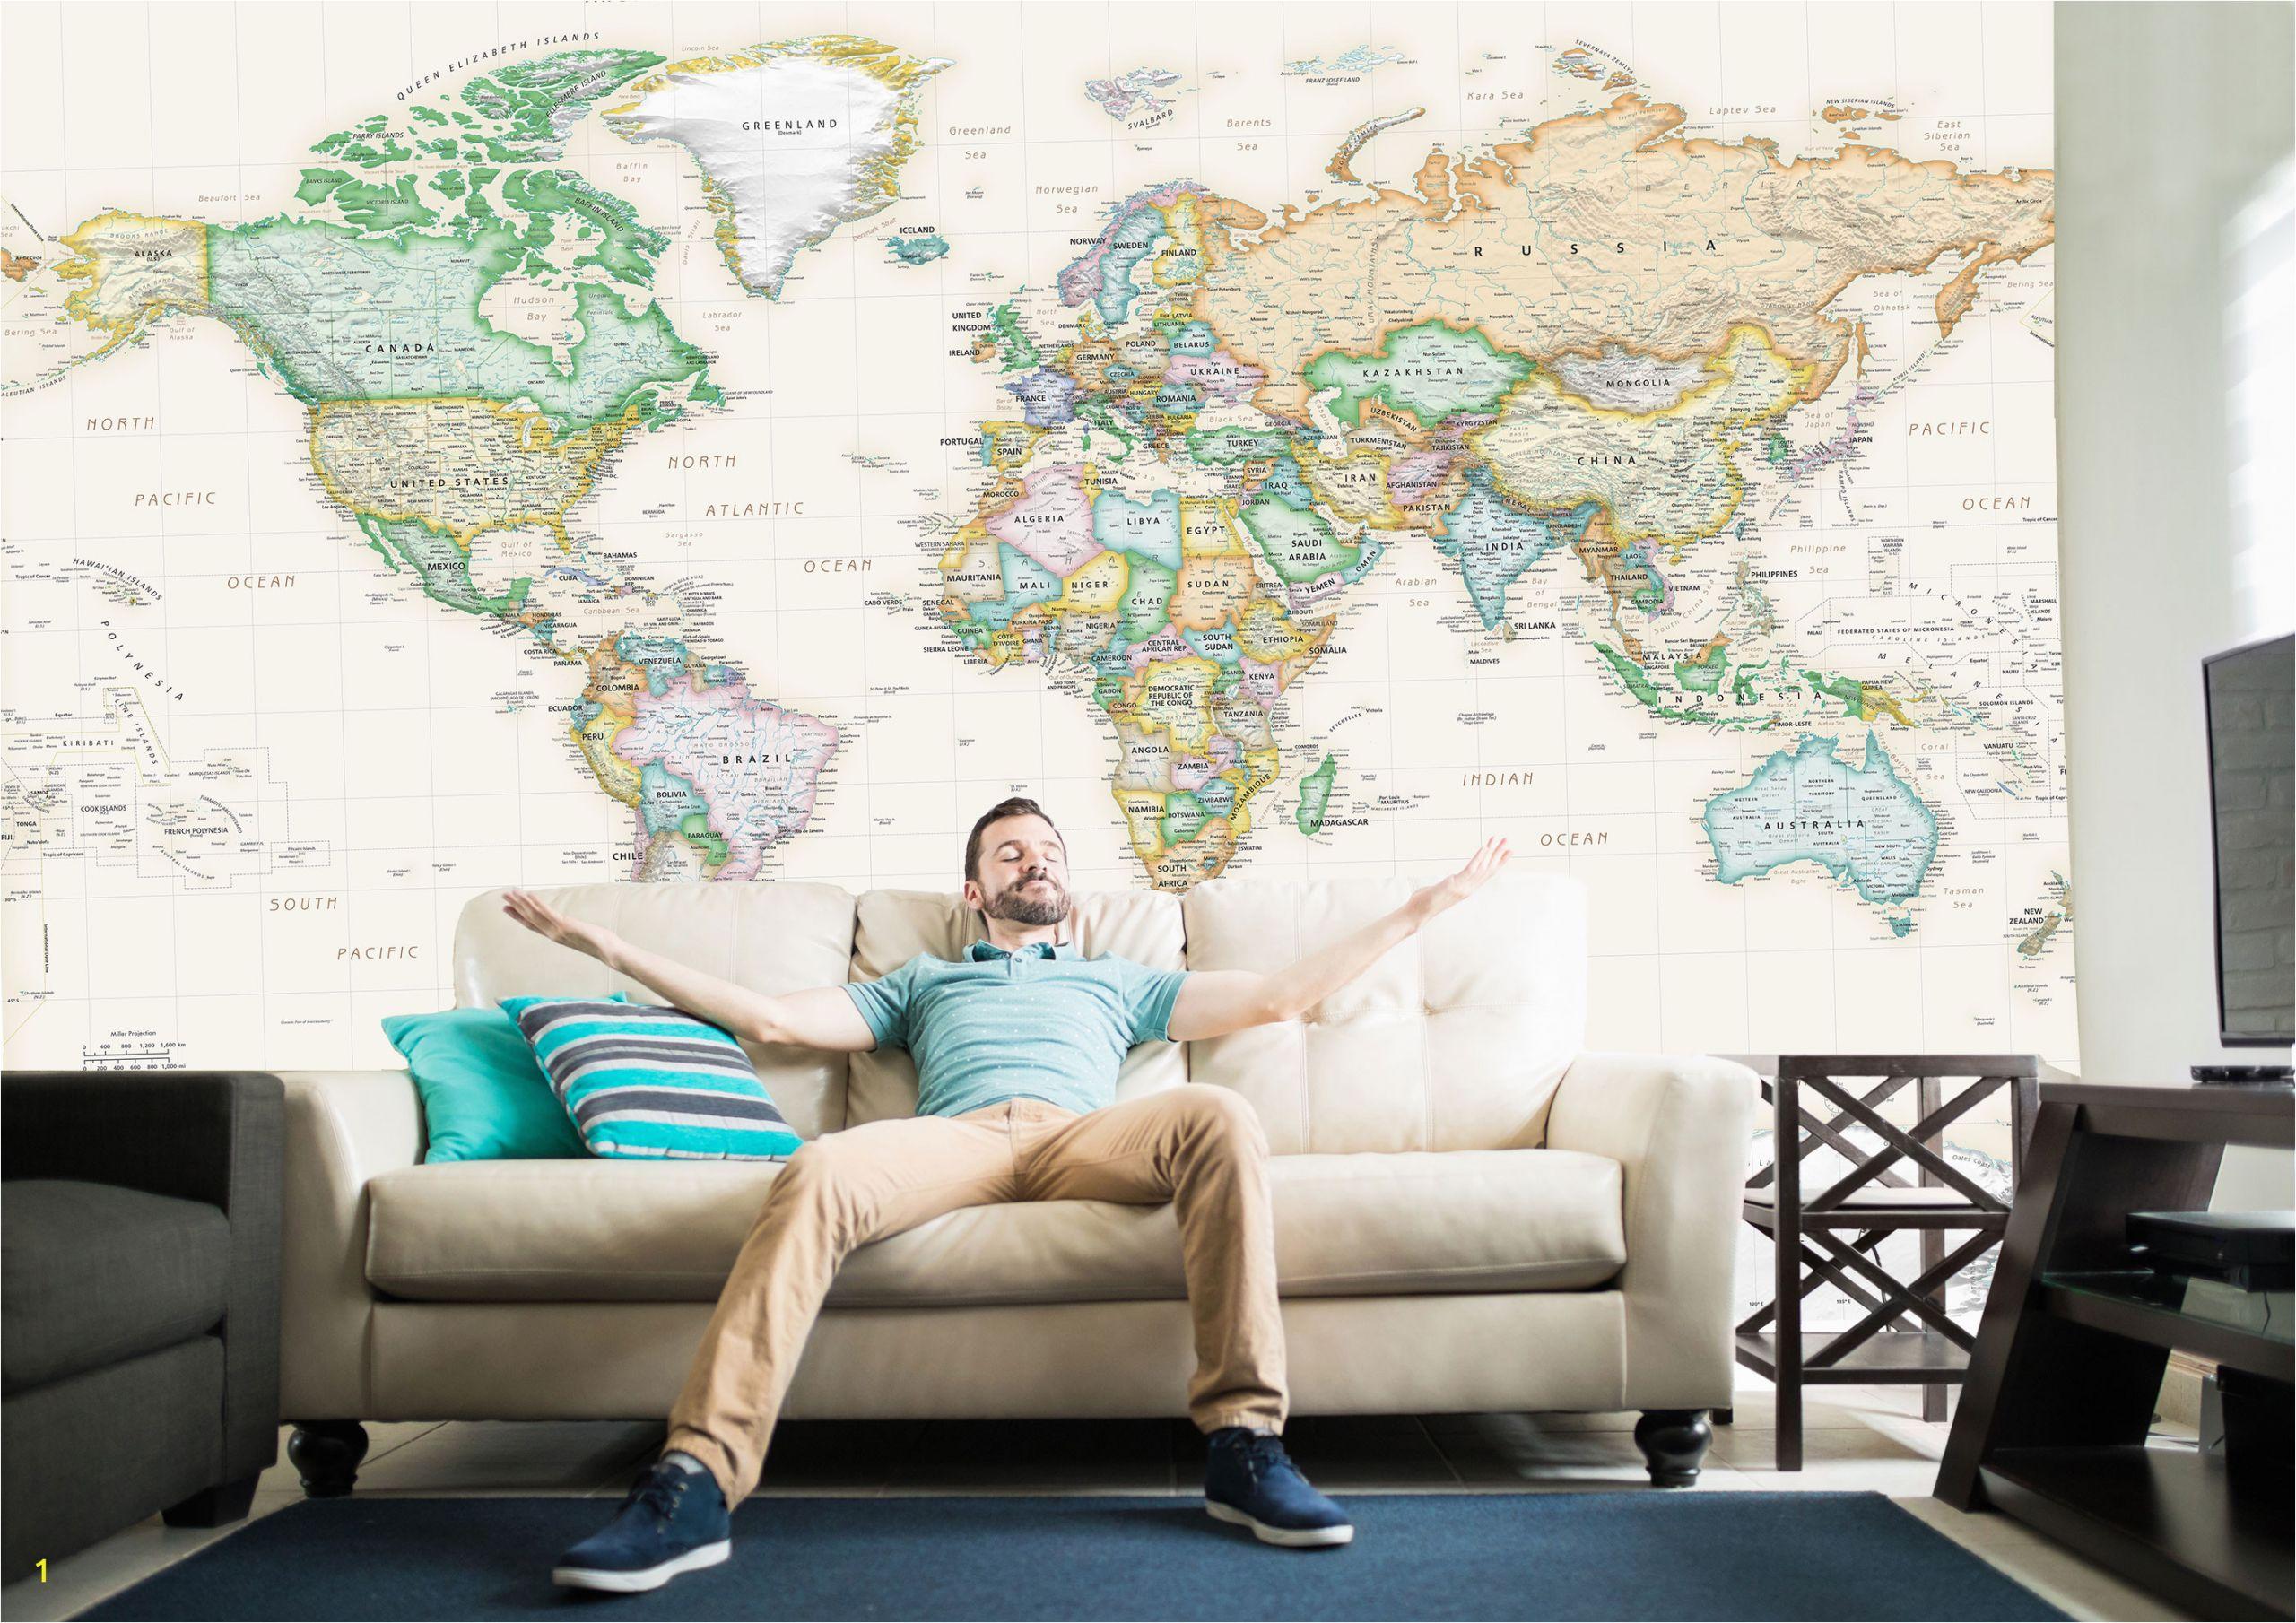 world executive political map mural academia lg 2